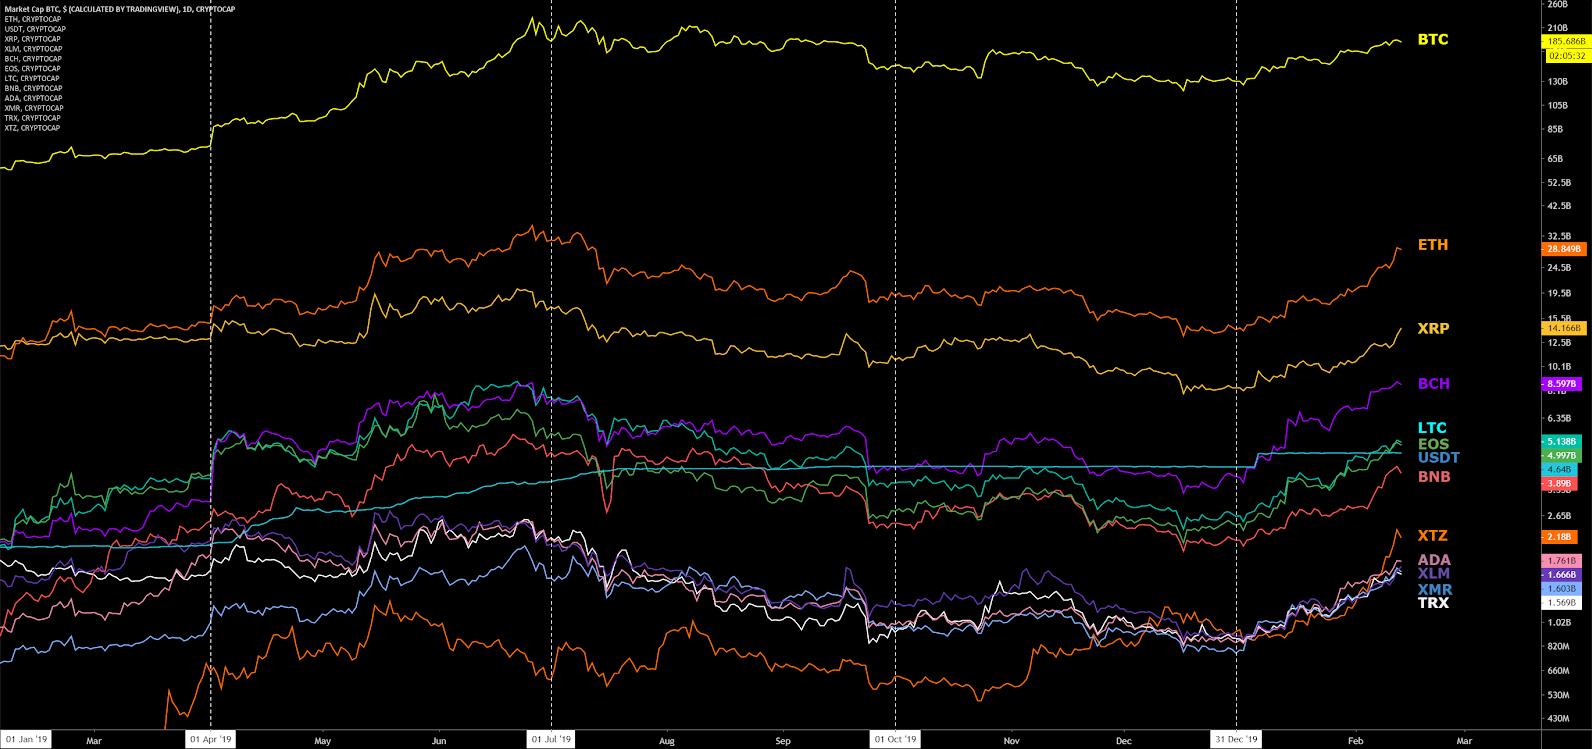 Bitcoin Price Analysis 14 Feb 2020 (1)